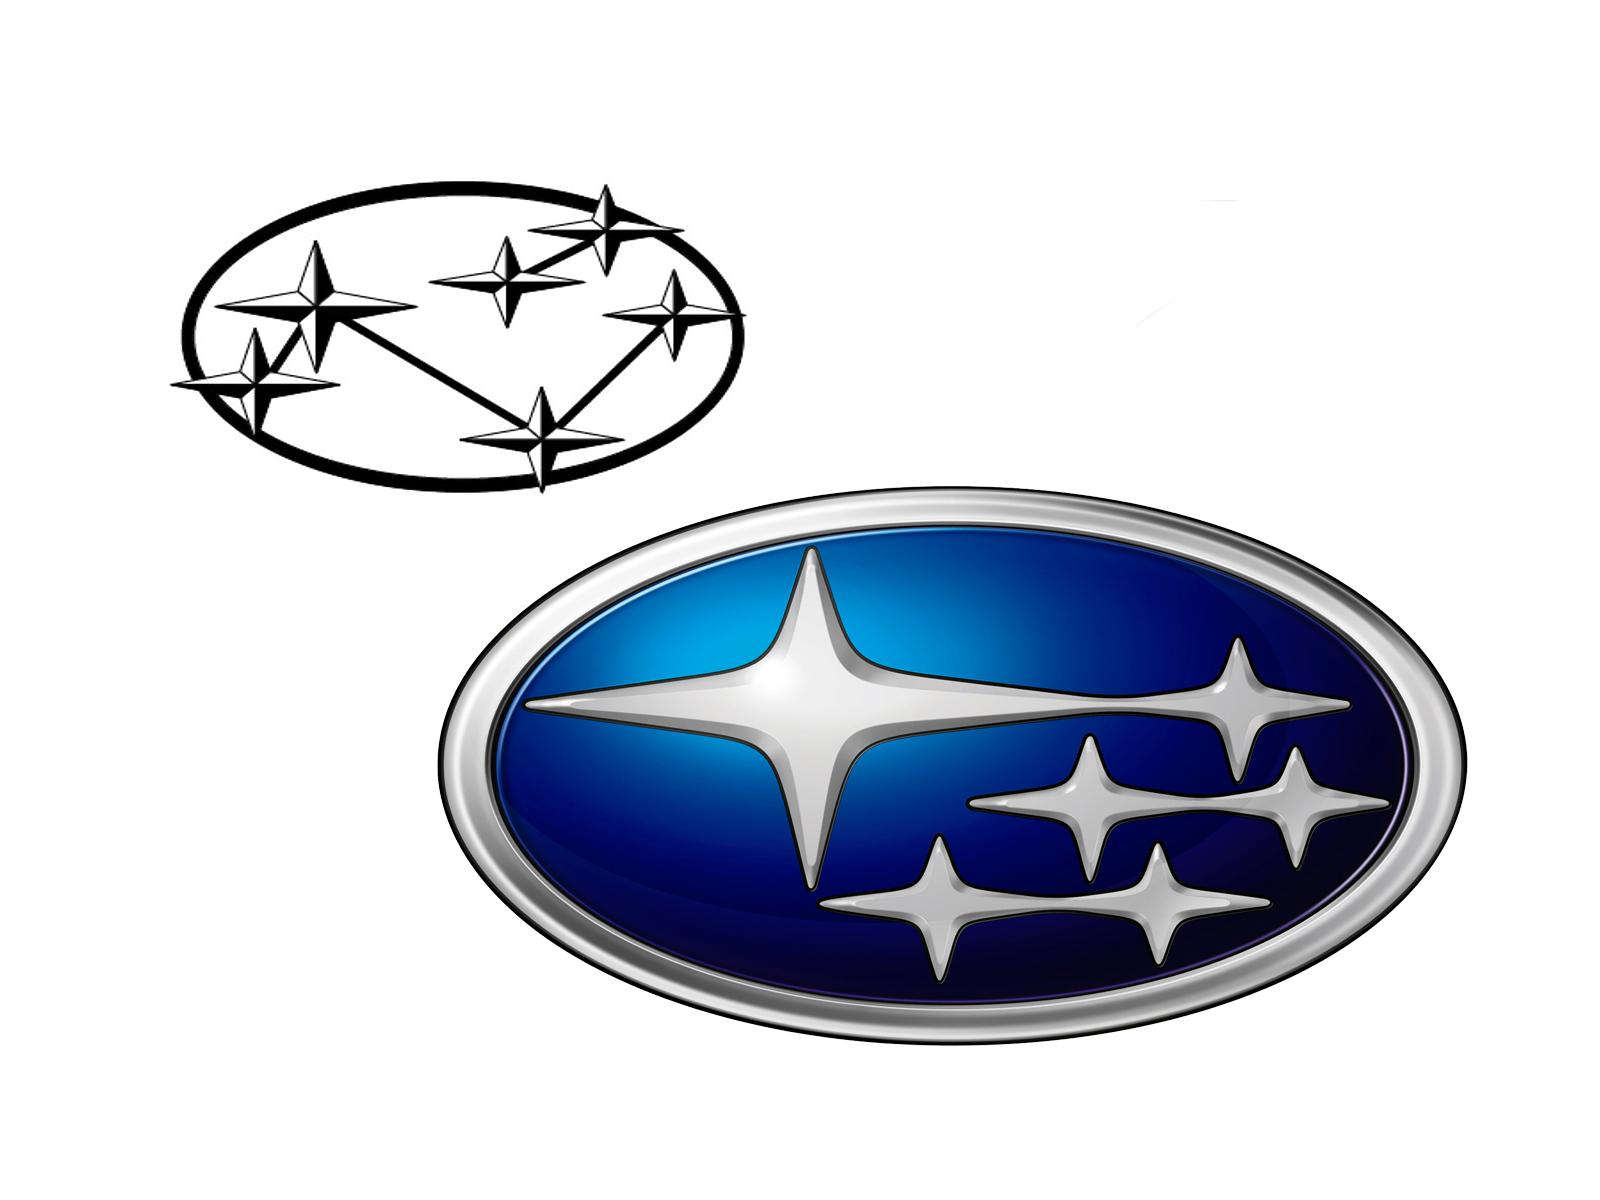 Автомобиль Со Знаком V